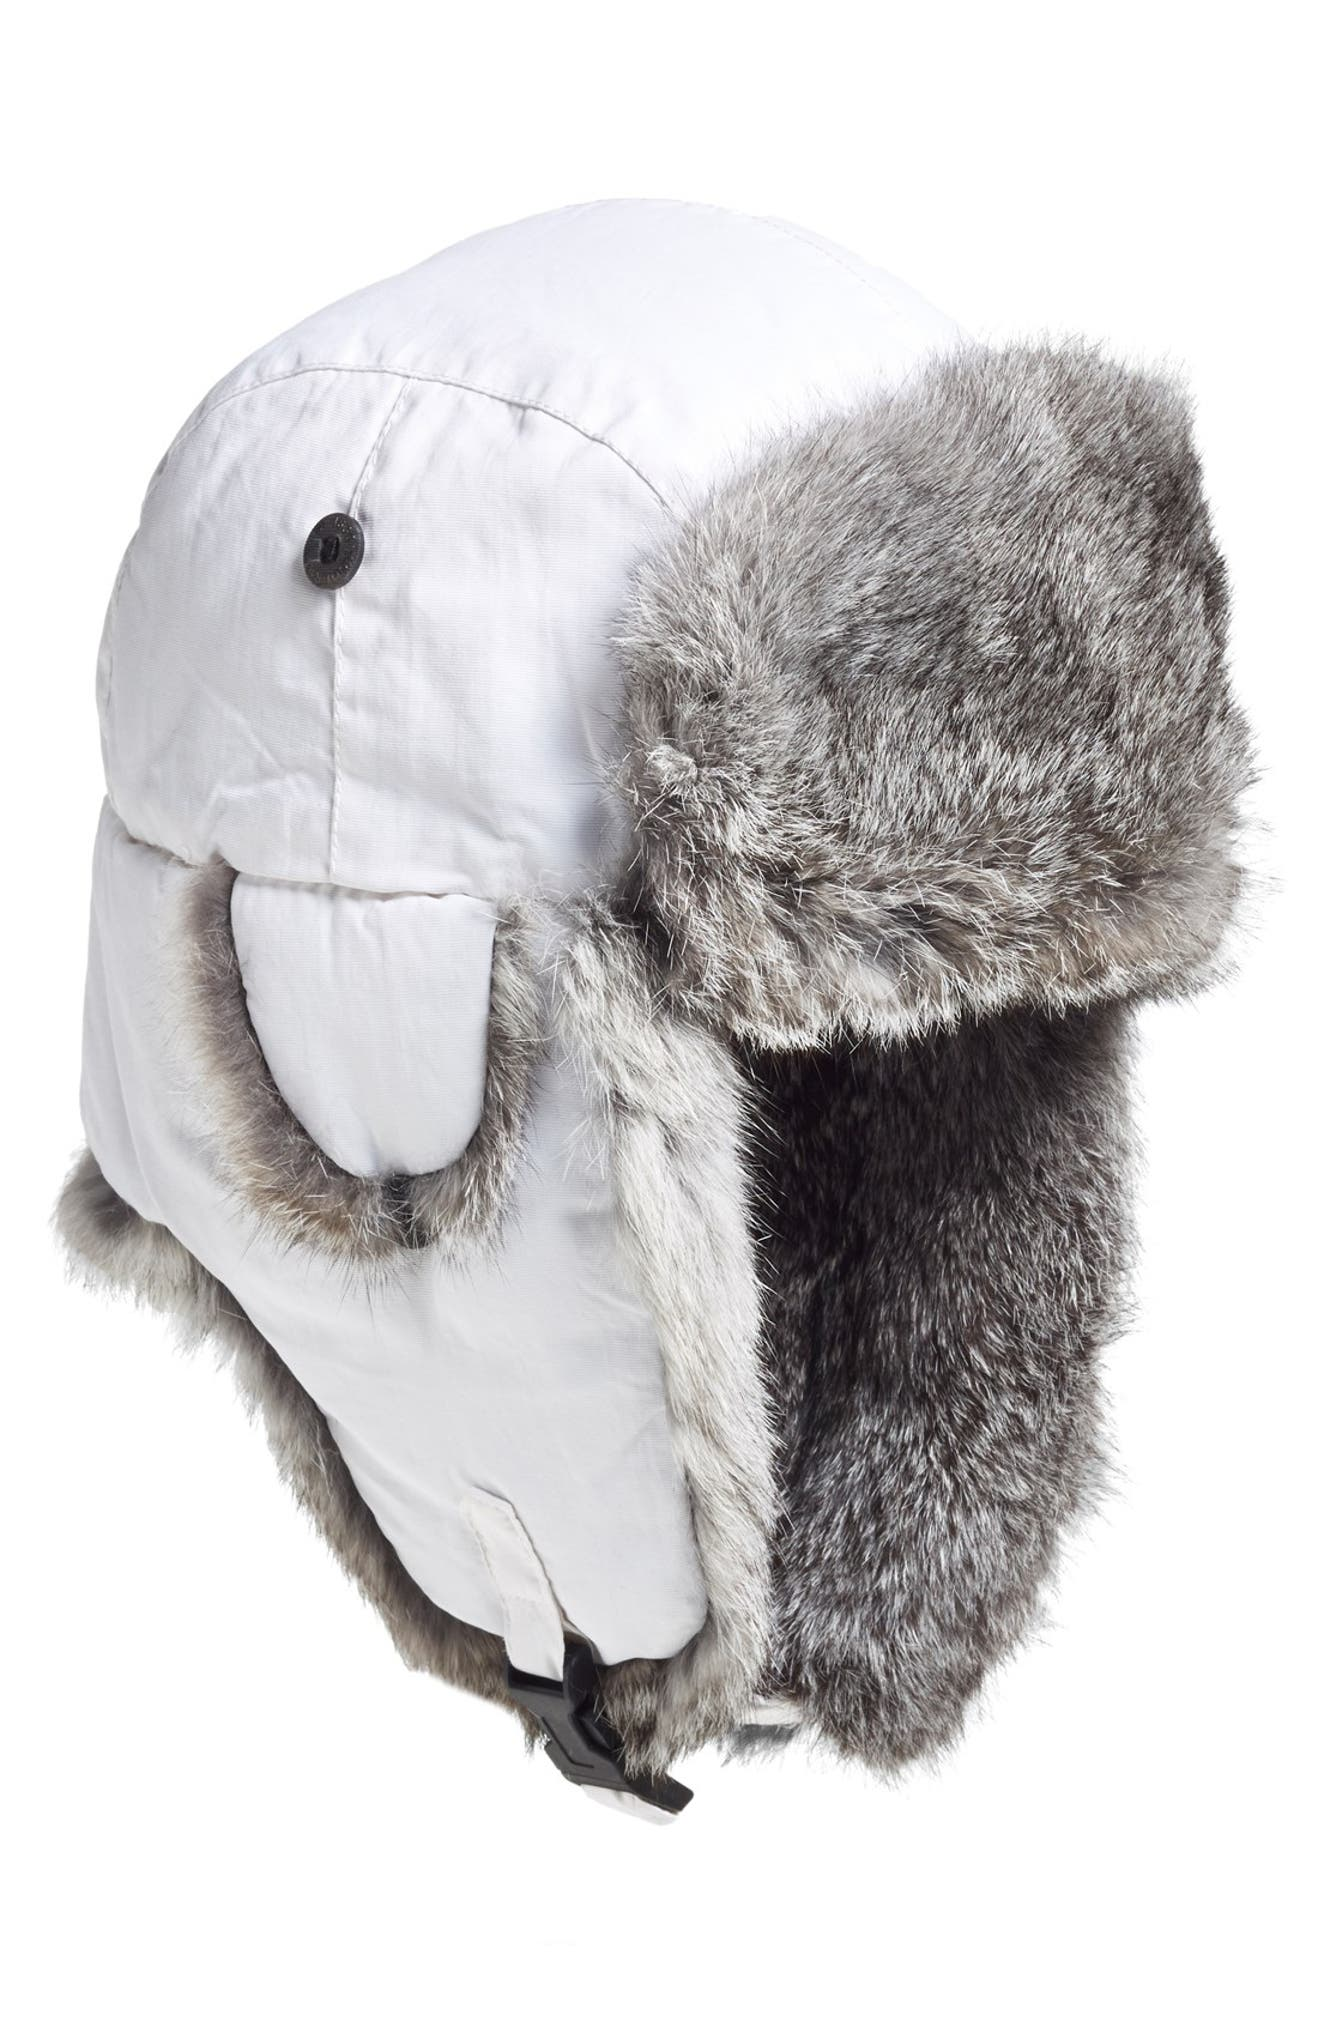 1035a30c6d9 Woolrich  Supplex  Genuine Rabbit Fur Lined Aviator Cap